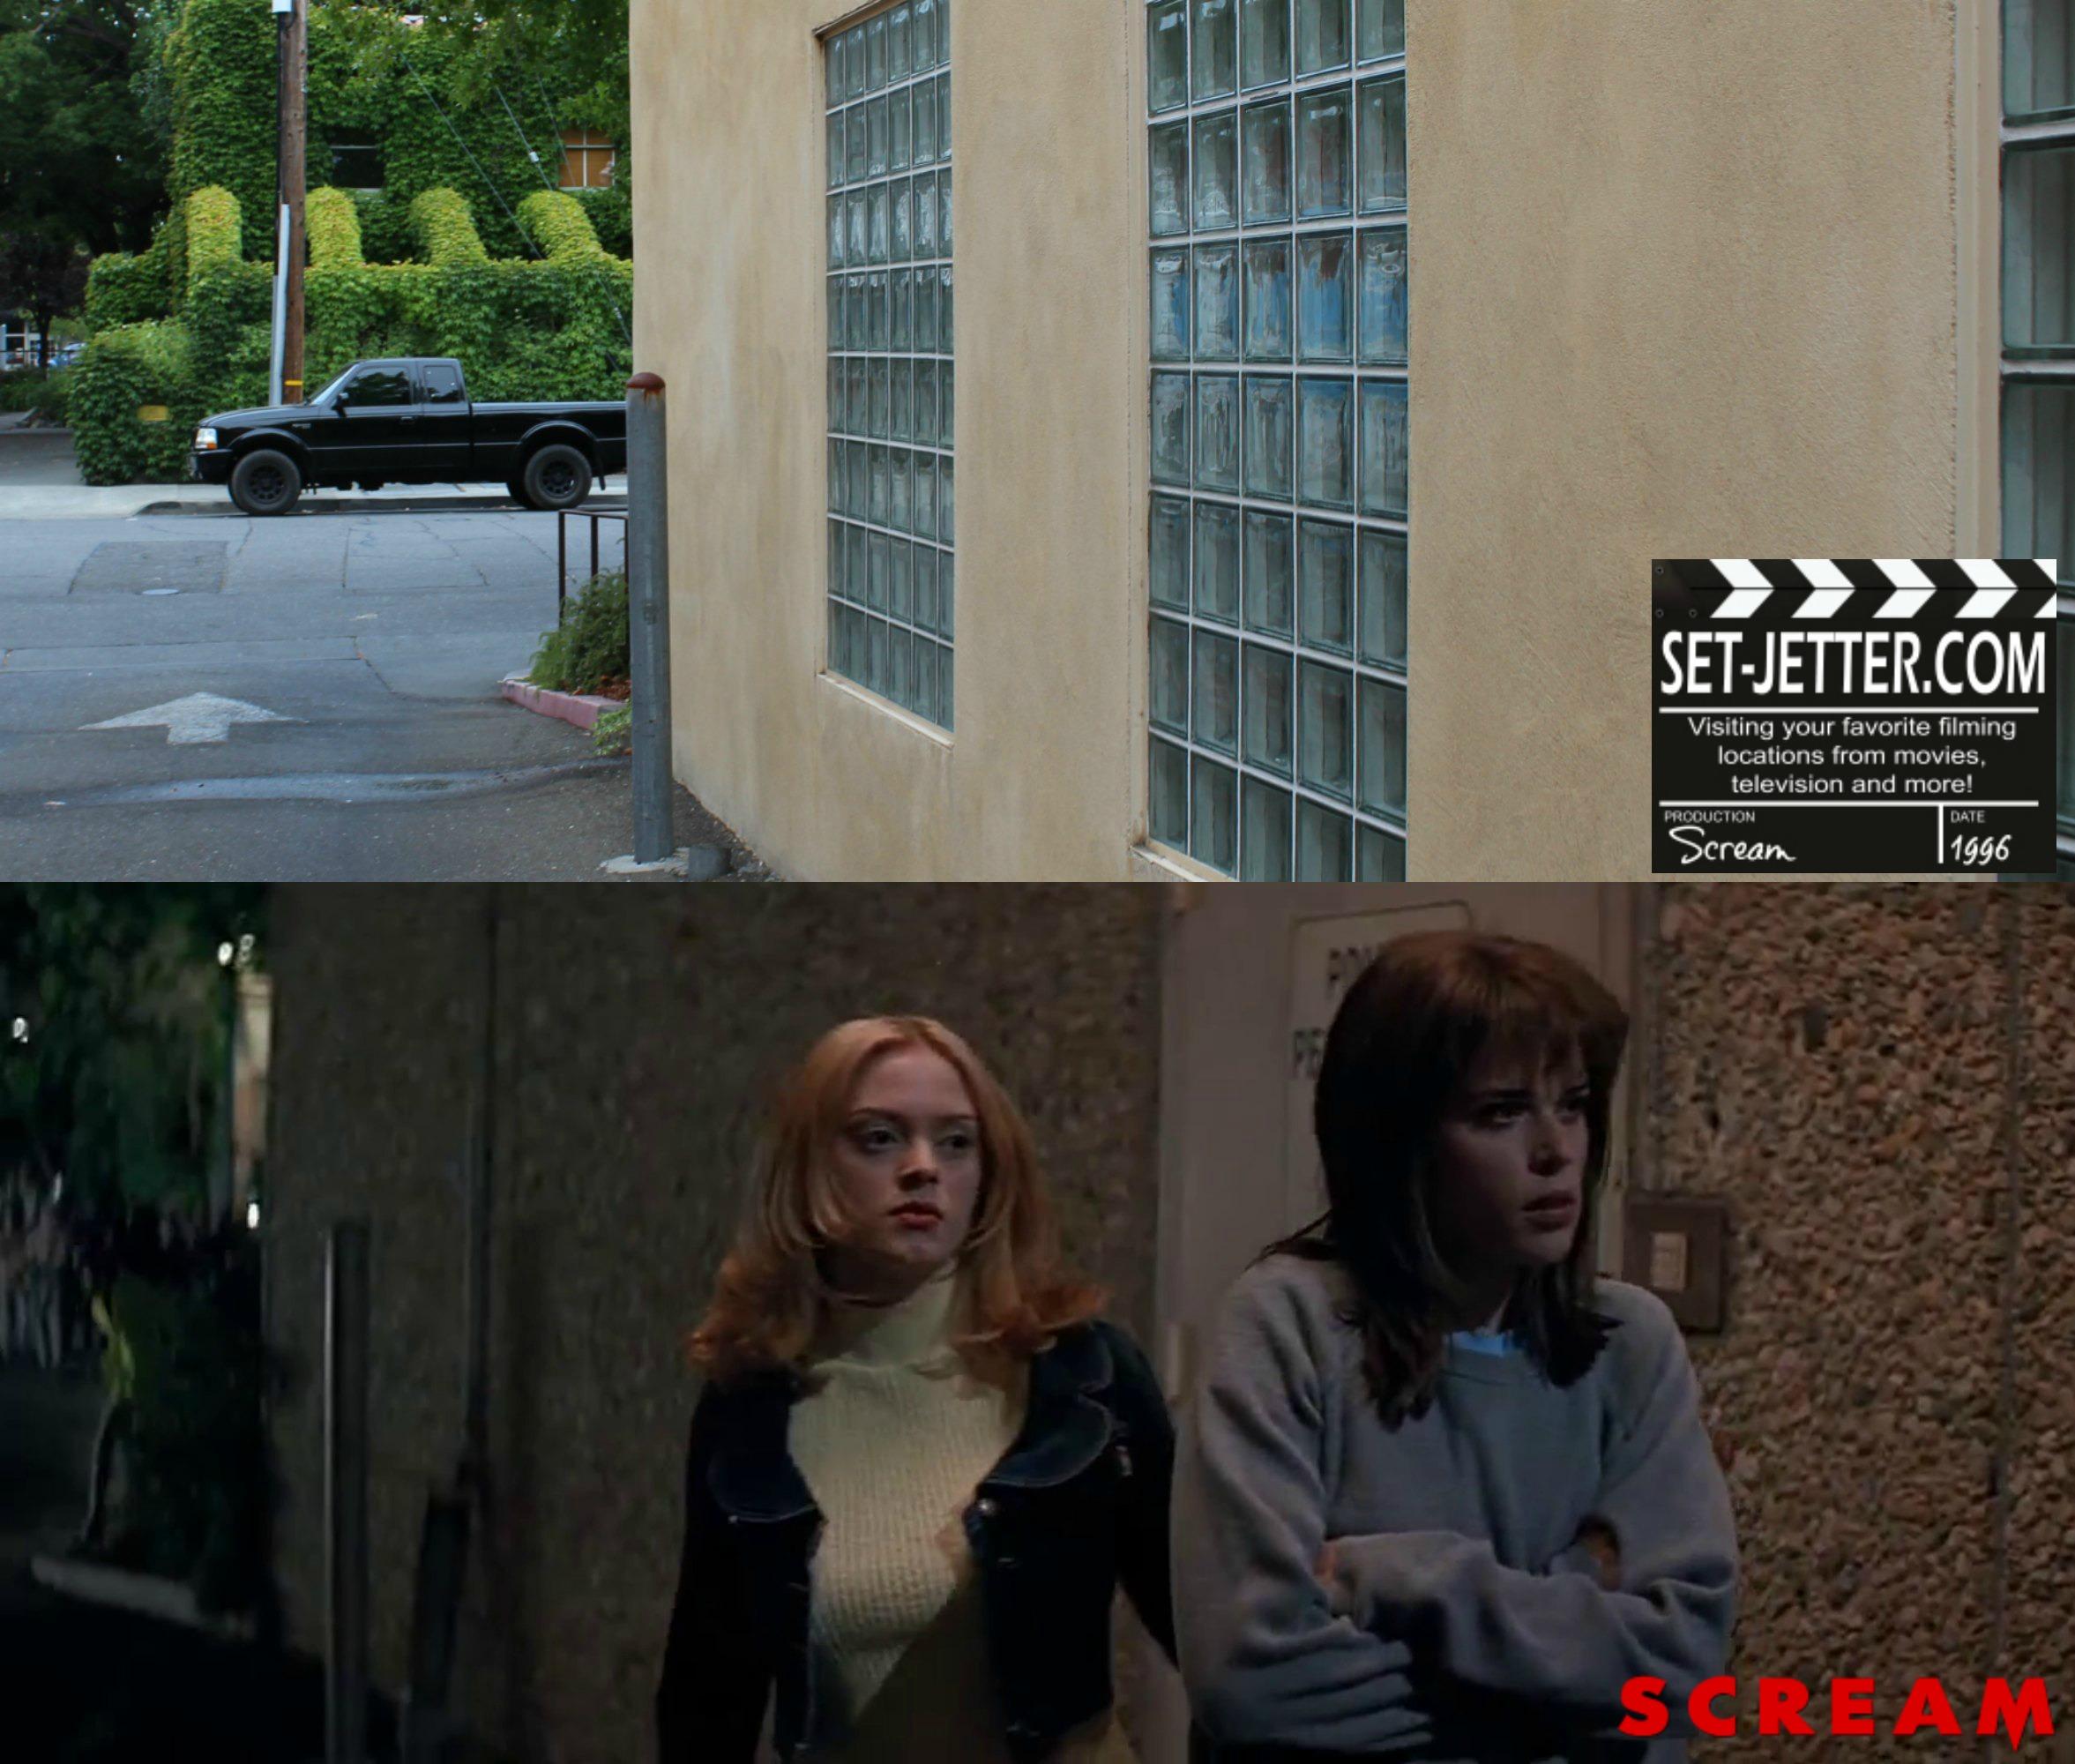 Scream comparison 59.jpg